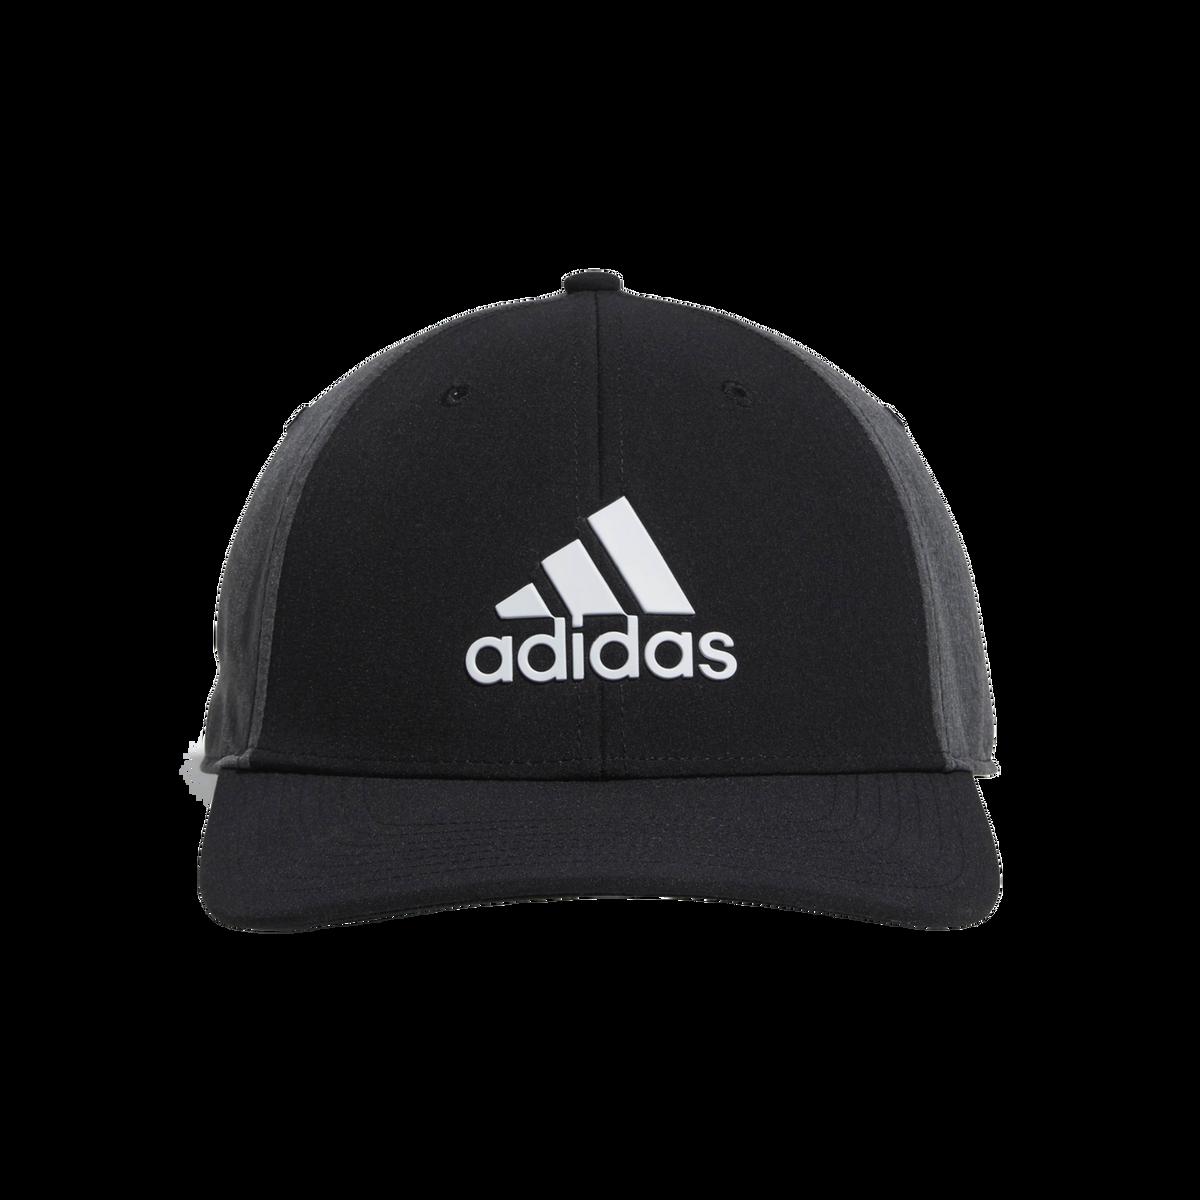 b93c856101371 adidas A-Stretch Badge of Sport Heather Tour Hat